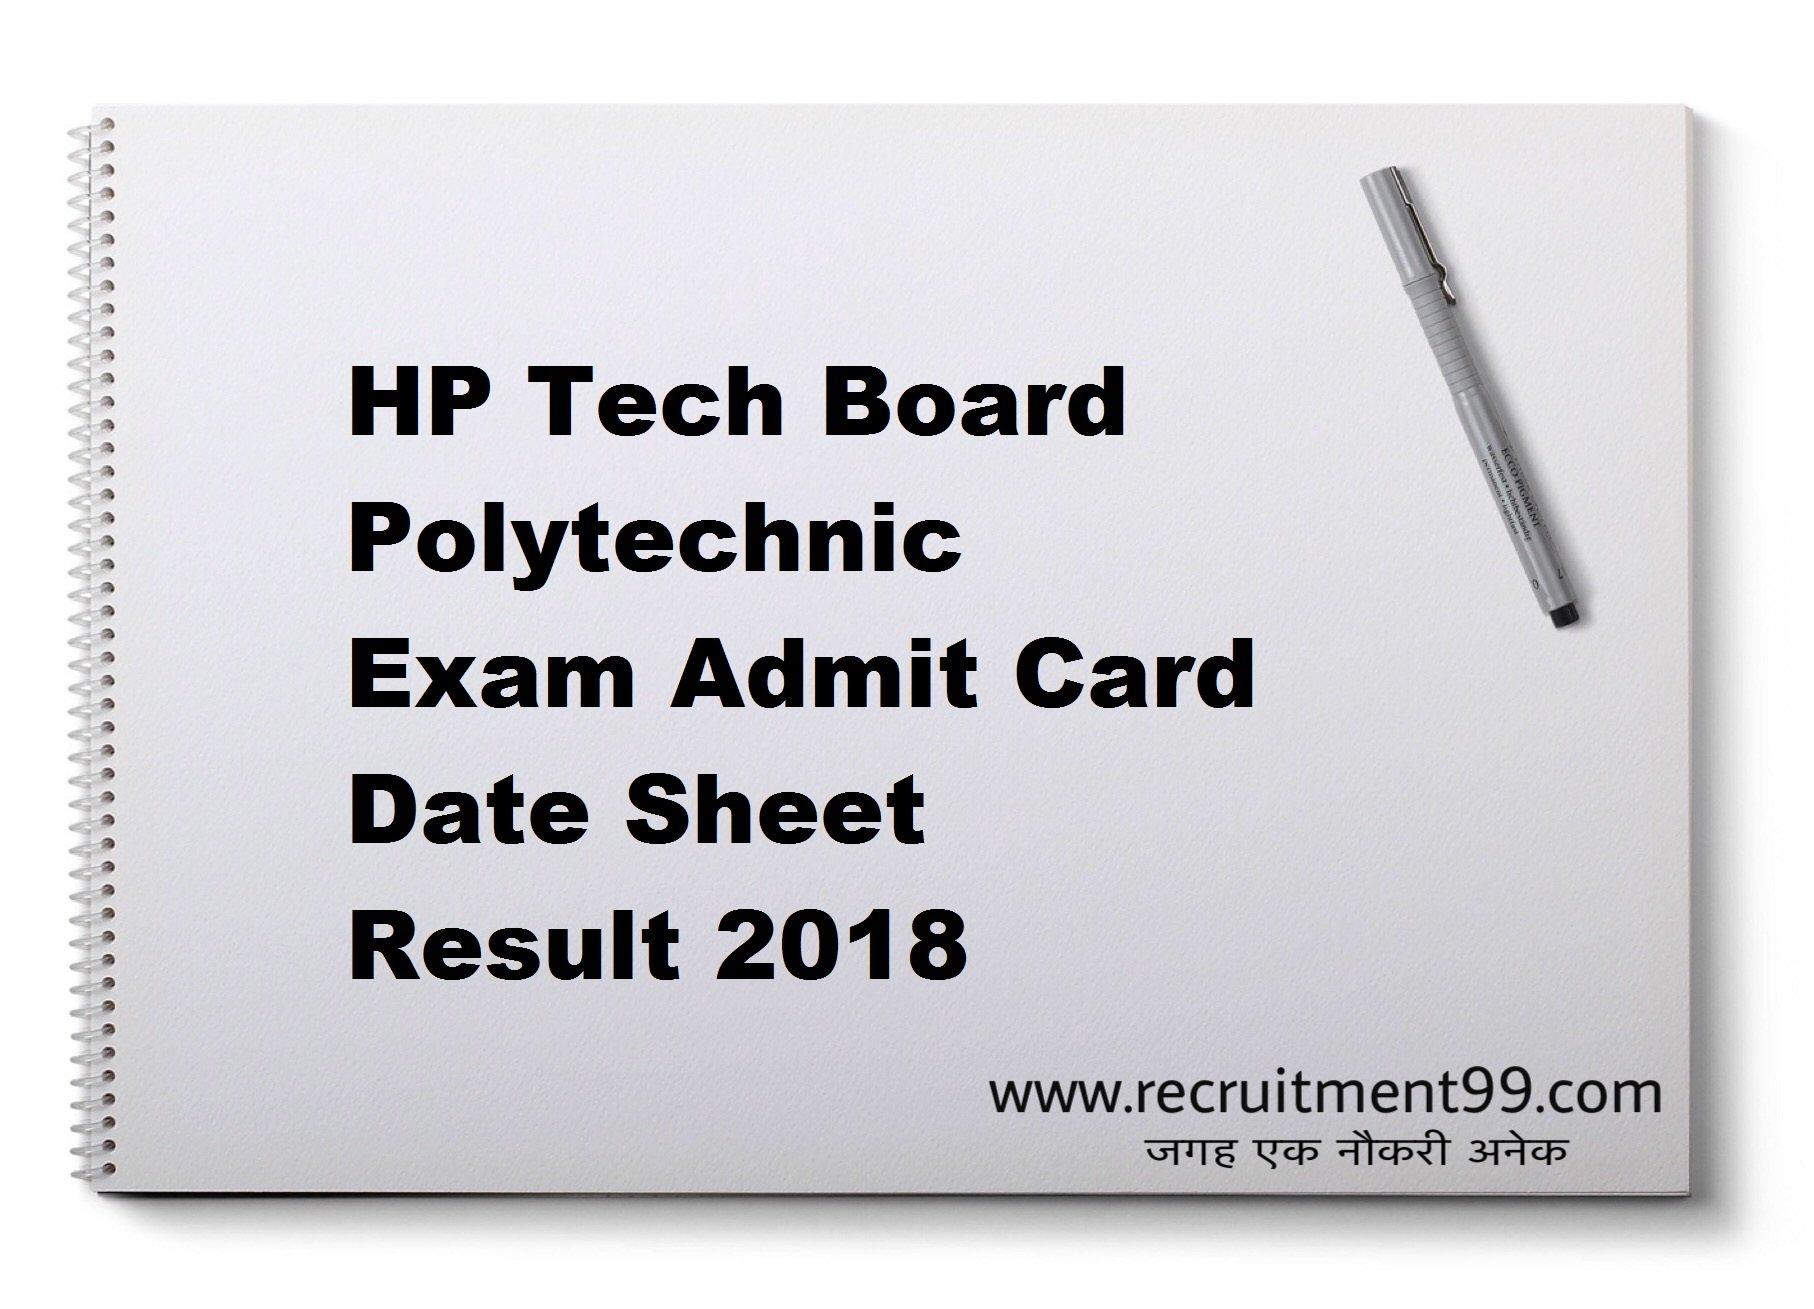 HP Tech Board Polytechnic Exam Admit Card Date Sheet Result 2018